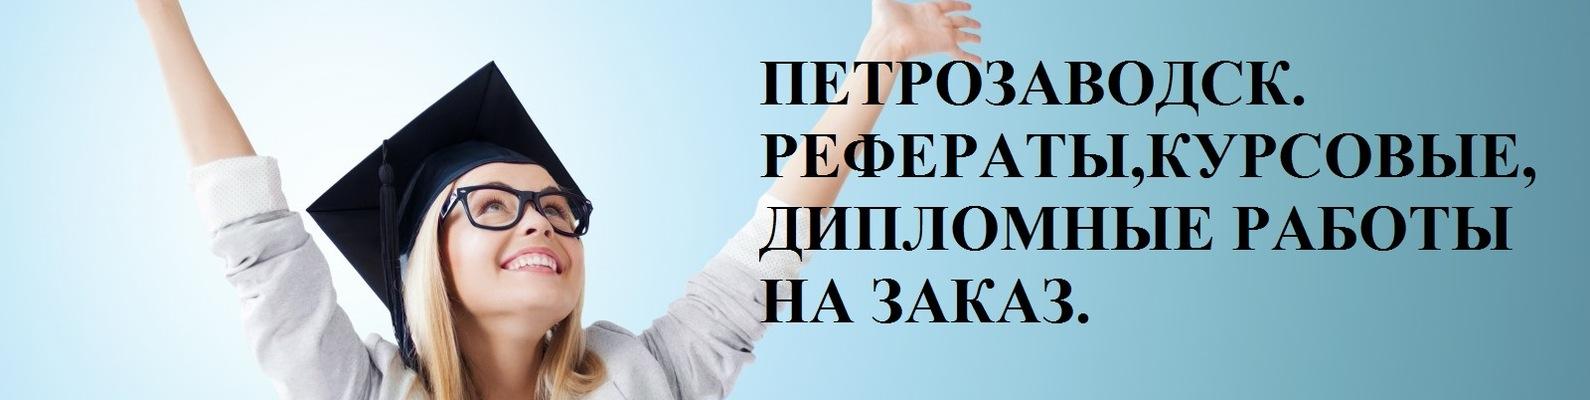 Реферат на заказ петрозаводск 6203